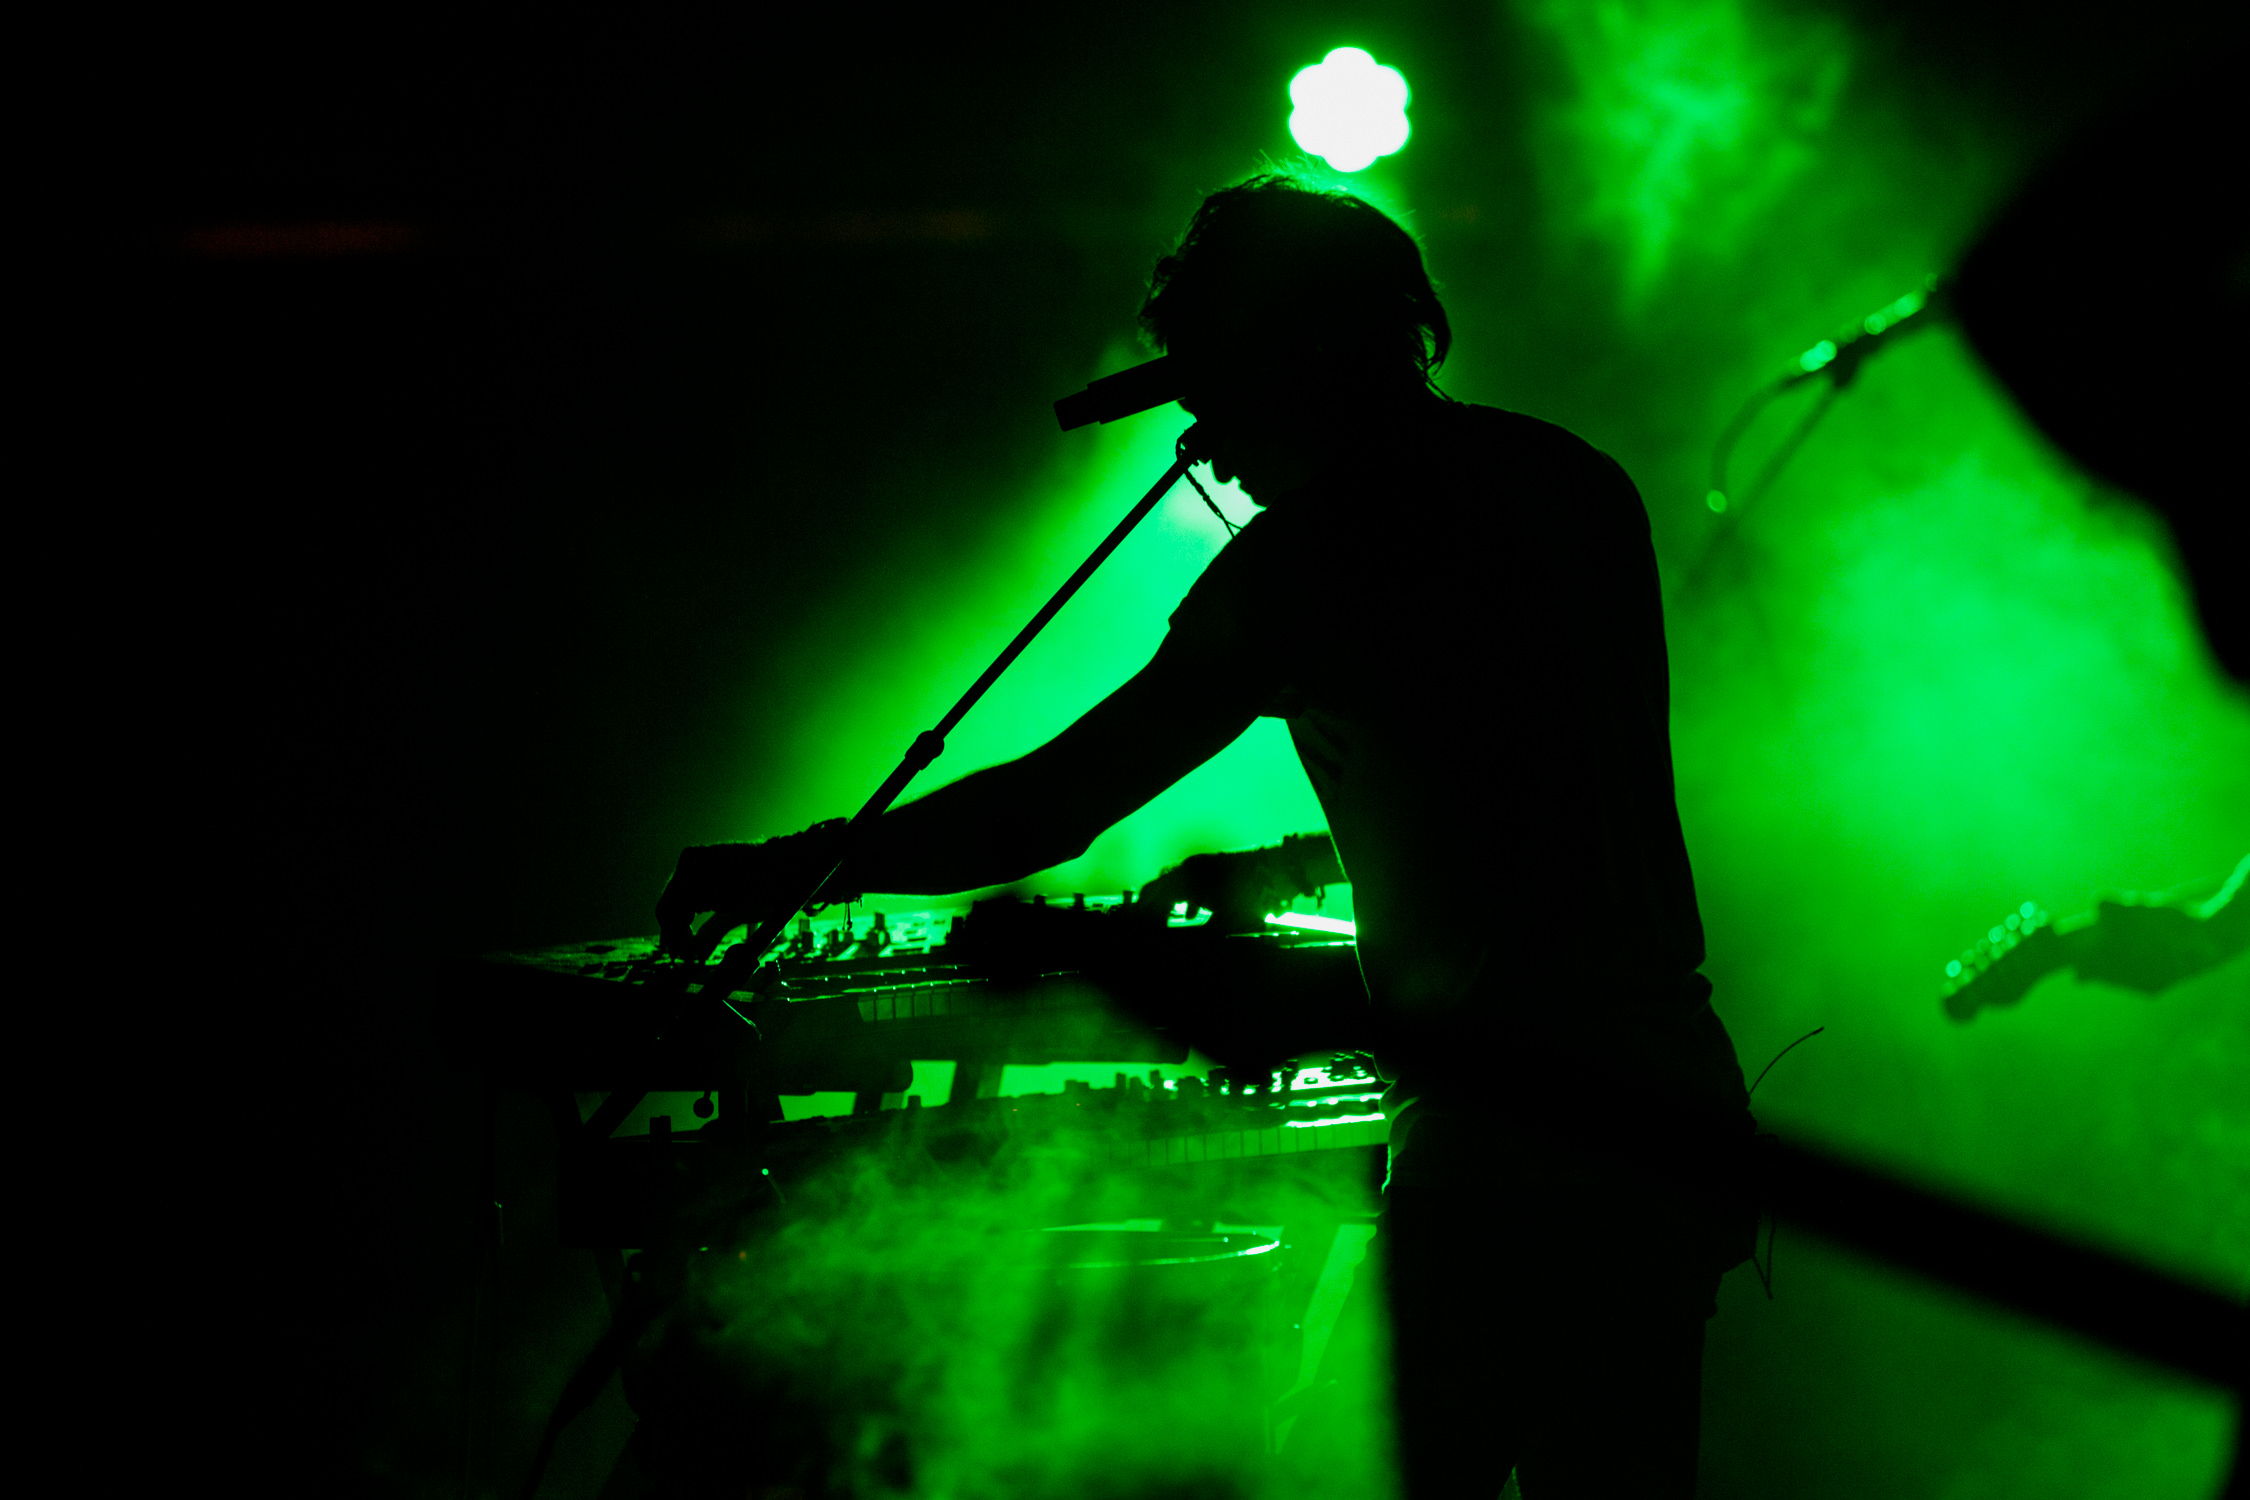 concert-keys-green-haze-silhouette-AnnaLeeMedia